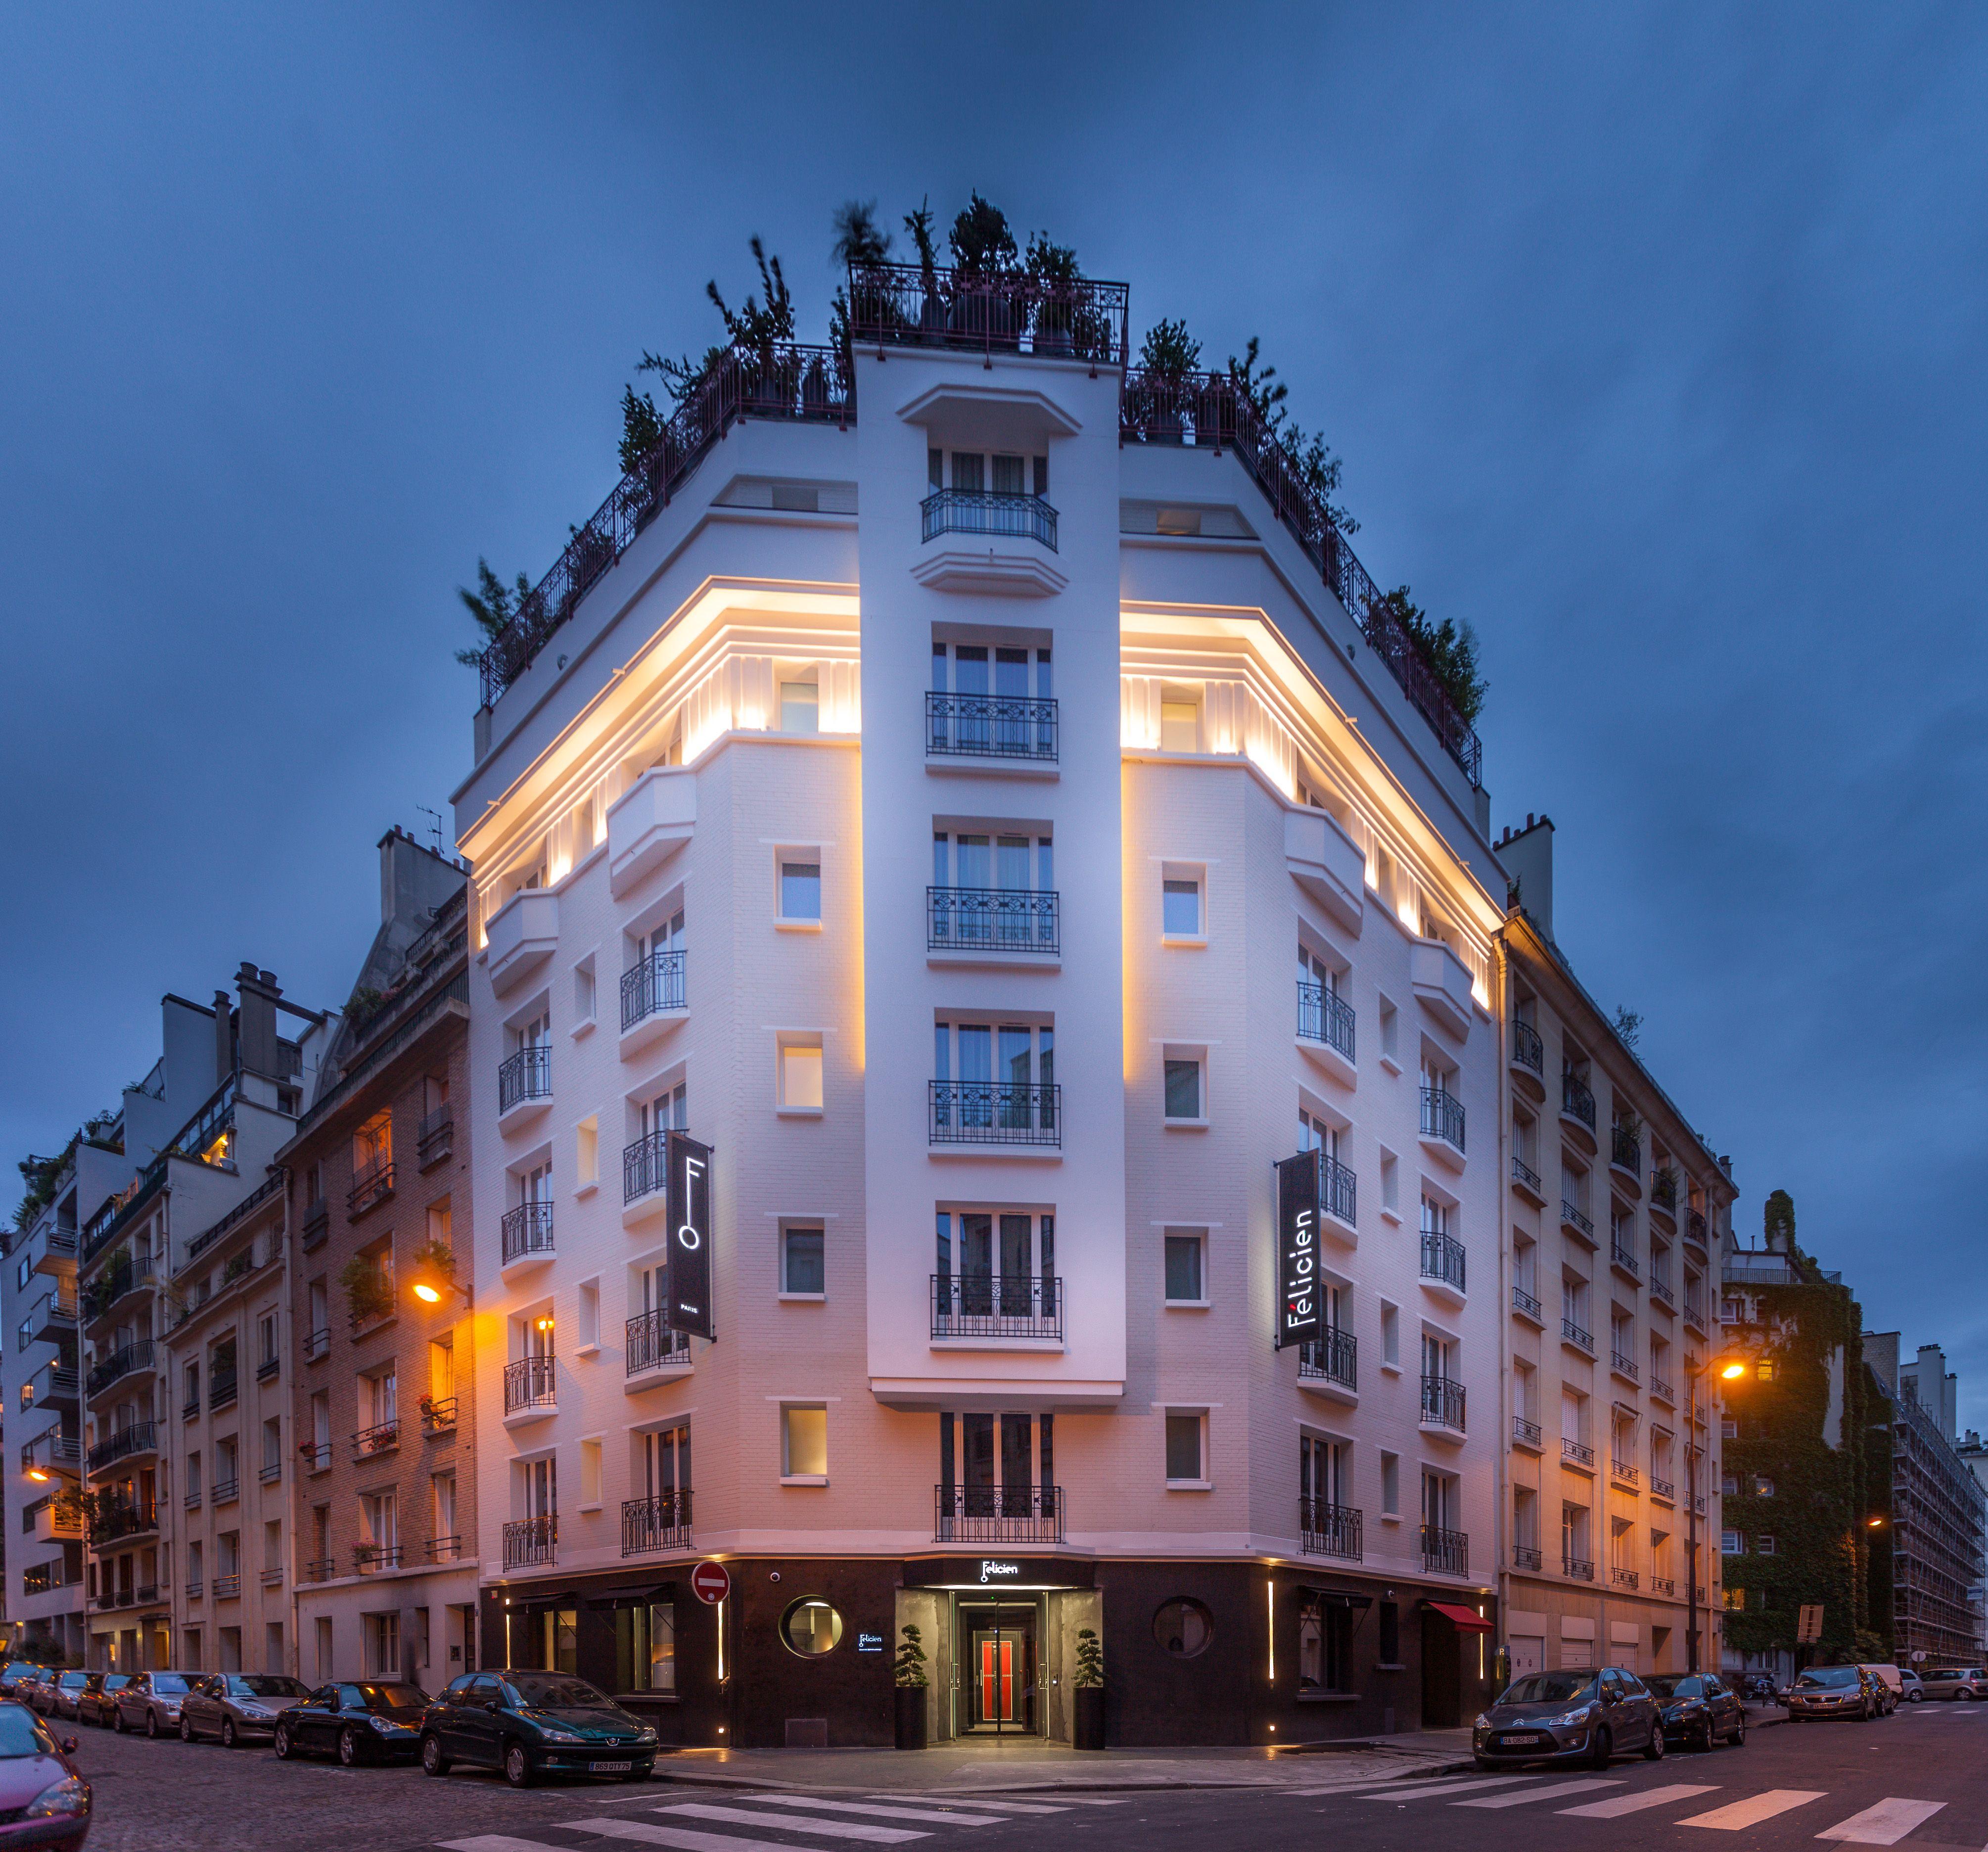 Marriott Hotels In Paris France Eiffel Tower